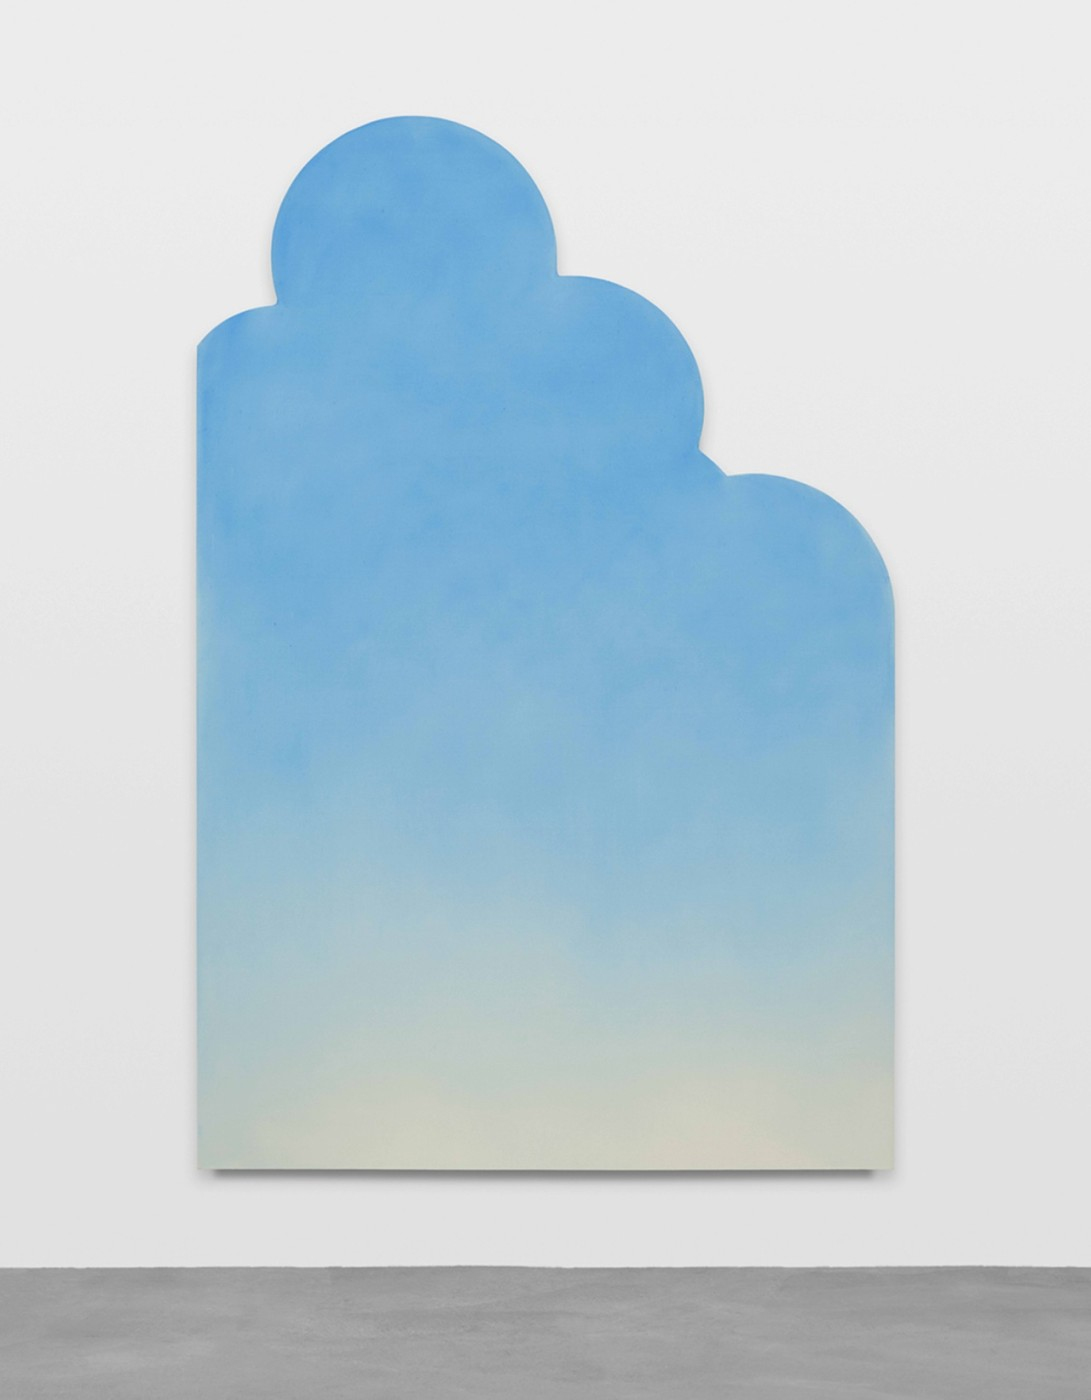 "<div class=""artwork_caption""><p>ersterjulizweitausendundfünfzehn, 2015</p></div>"